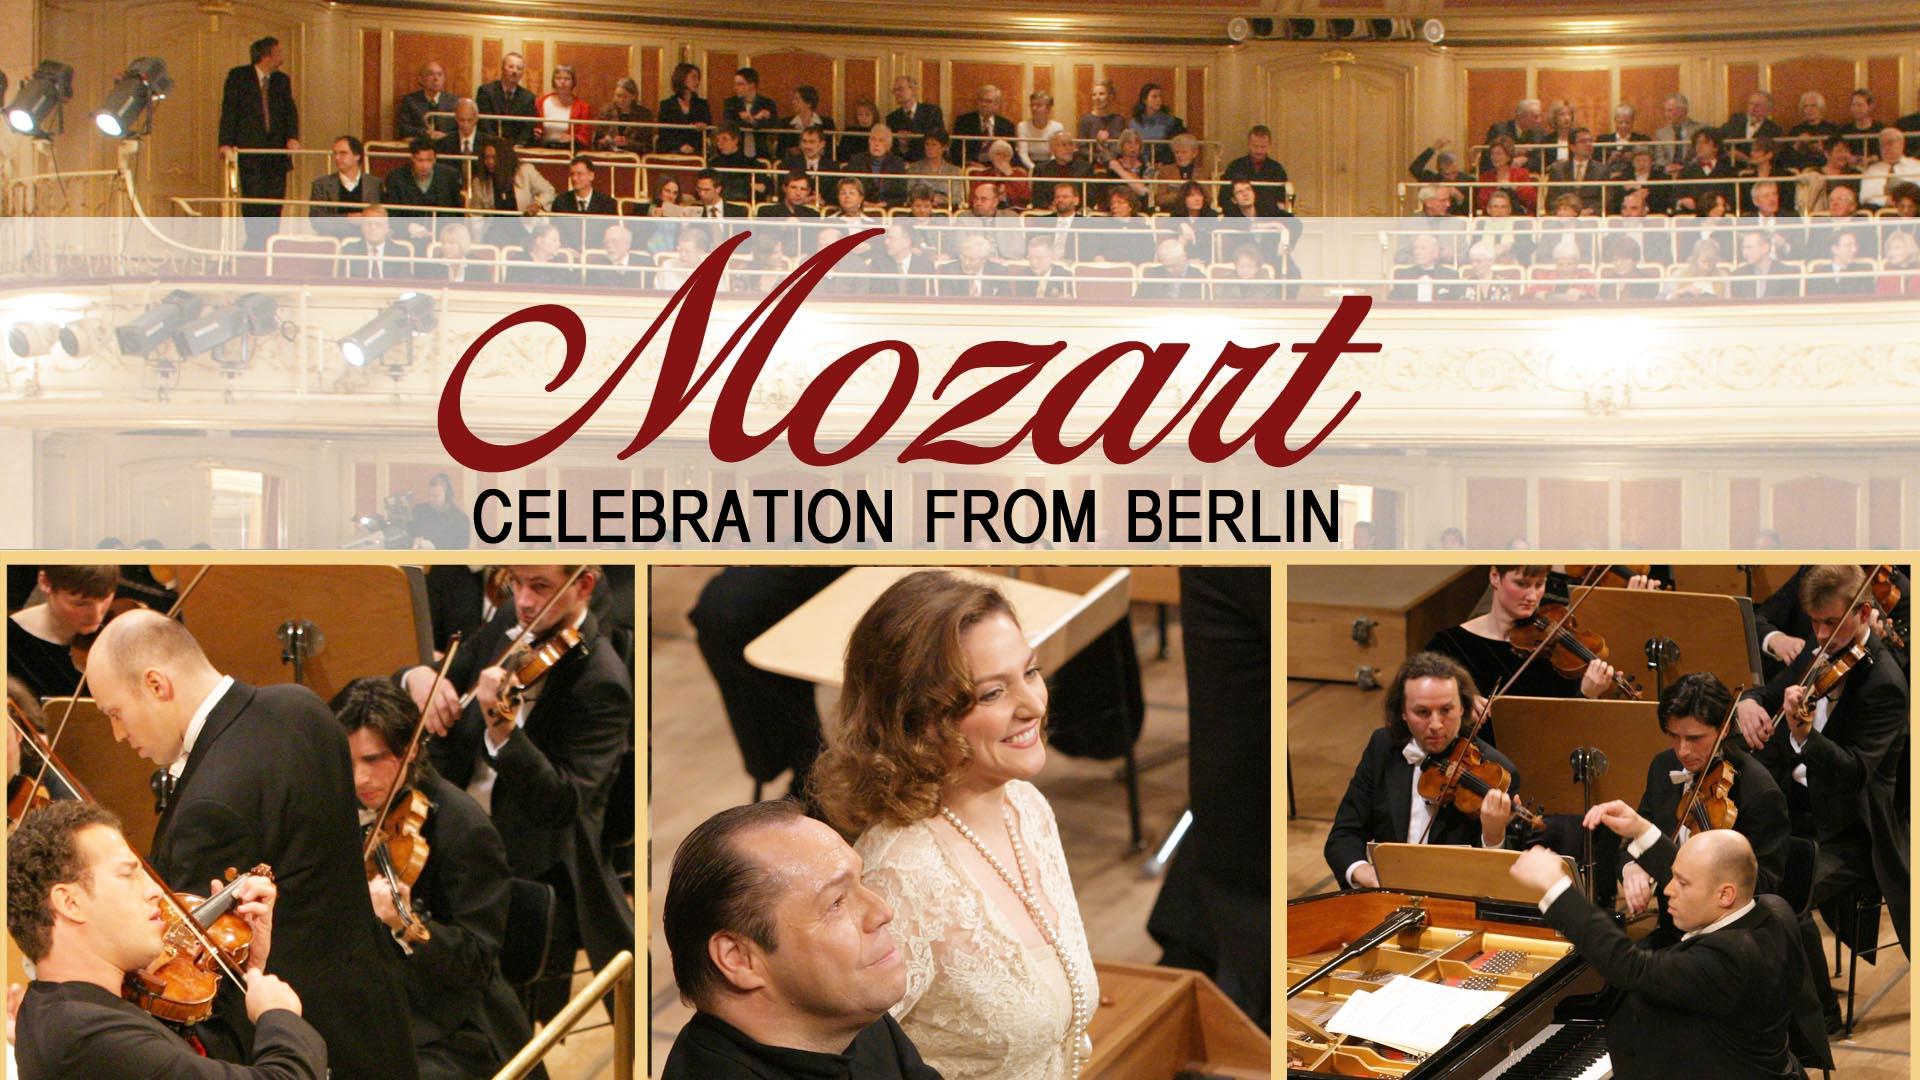 Mozart Celebration from Berlin